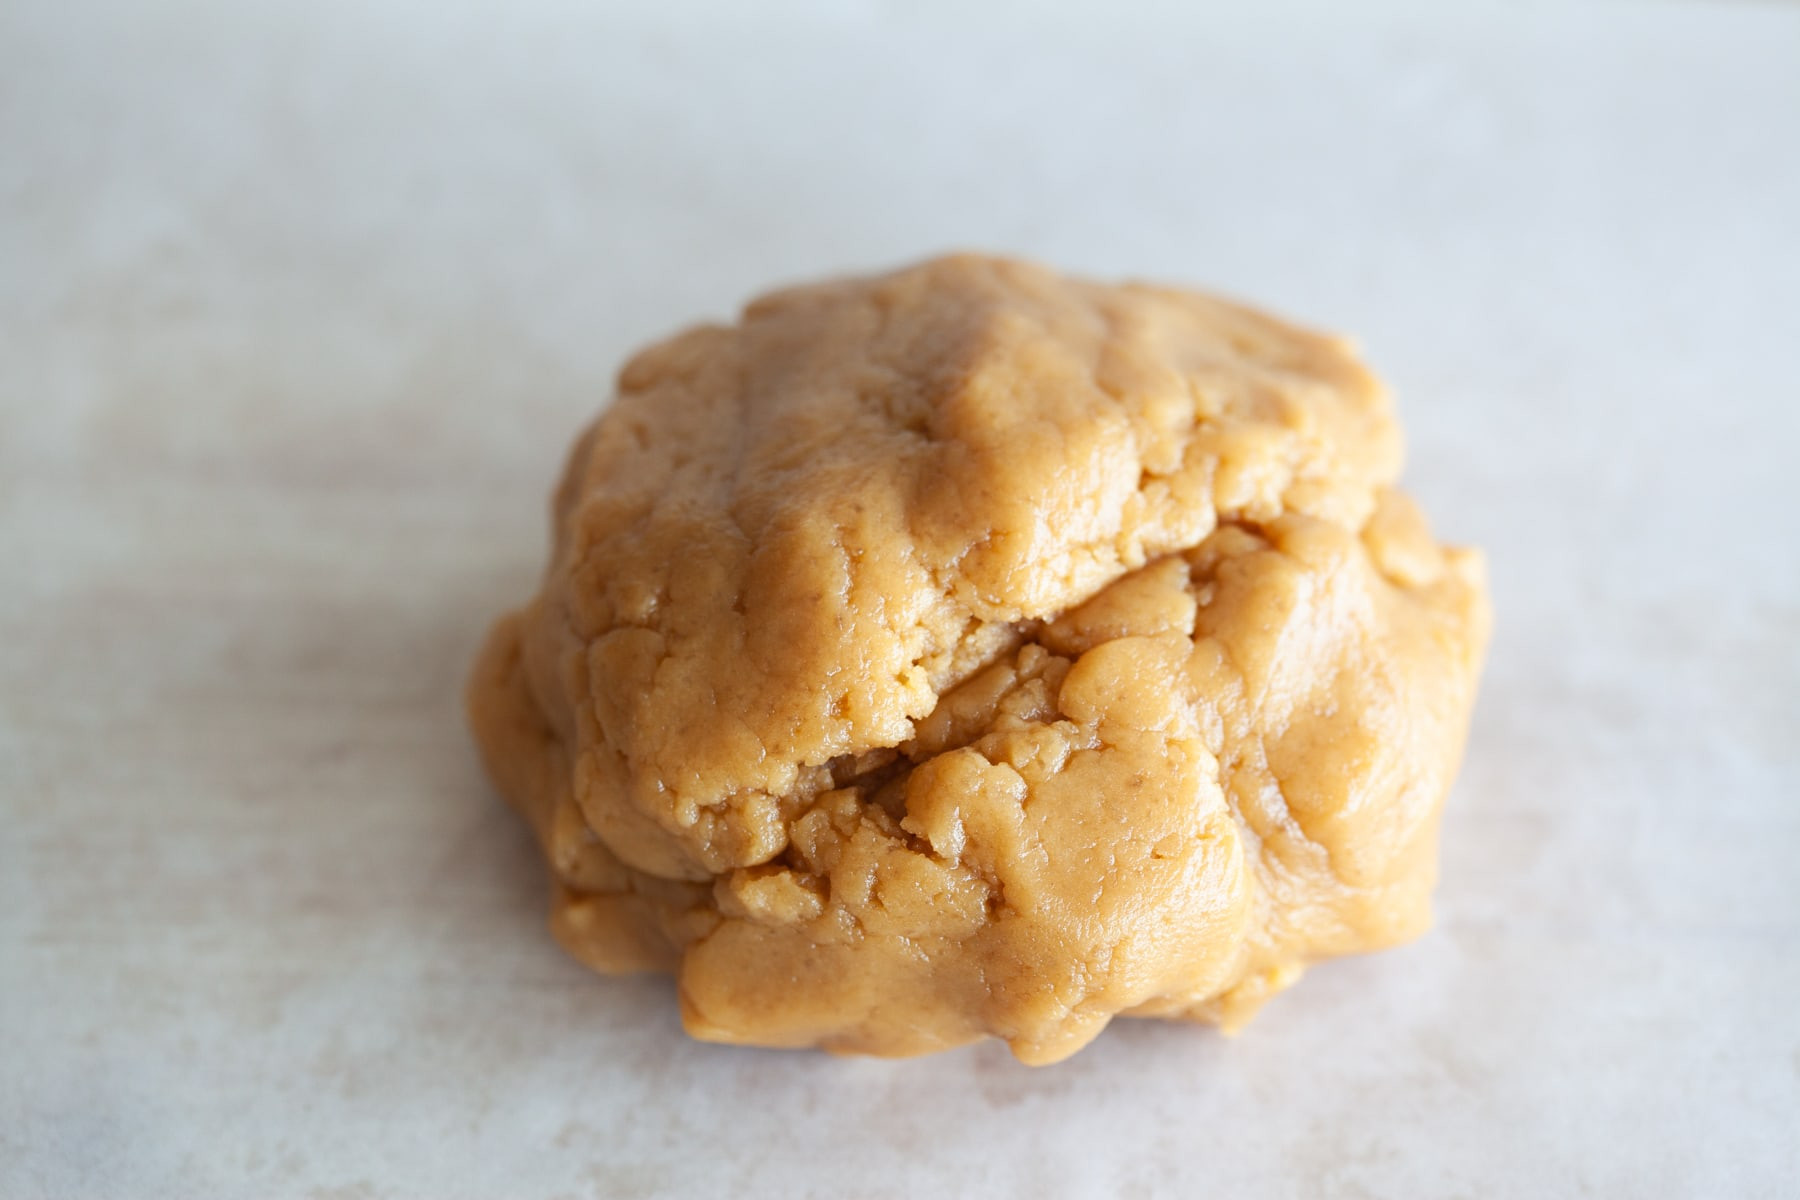 Peanut butter cookie dough.